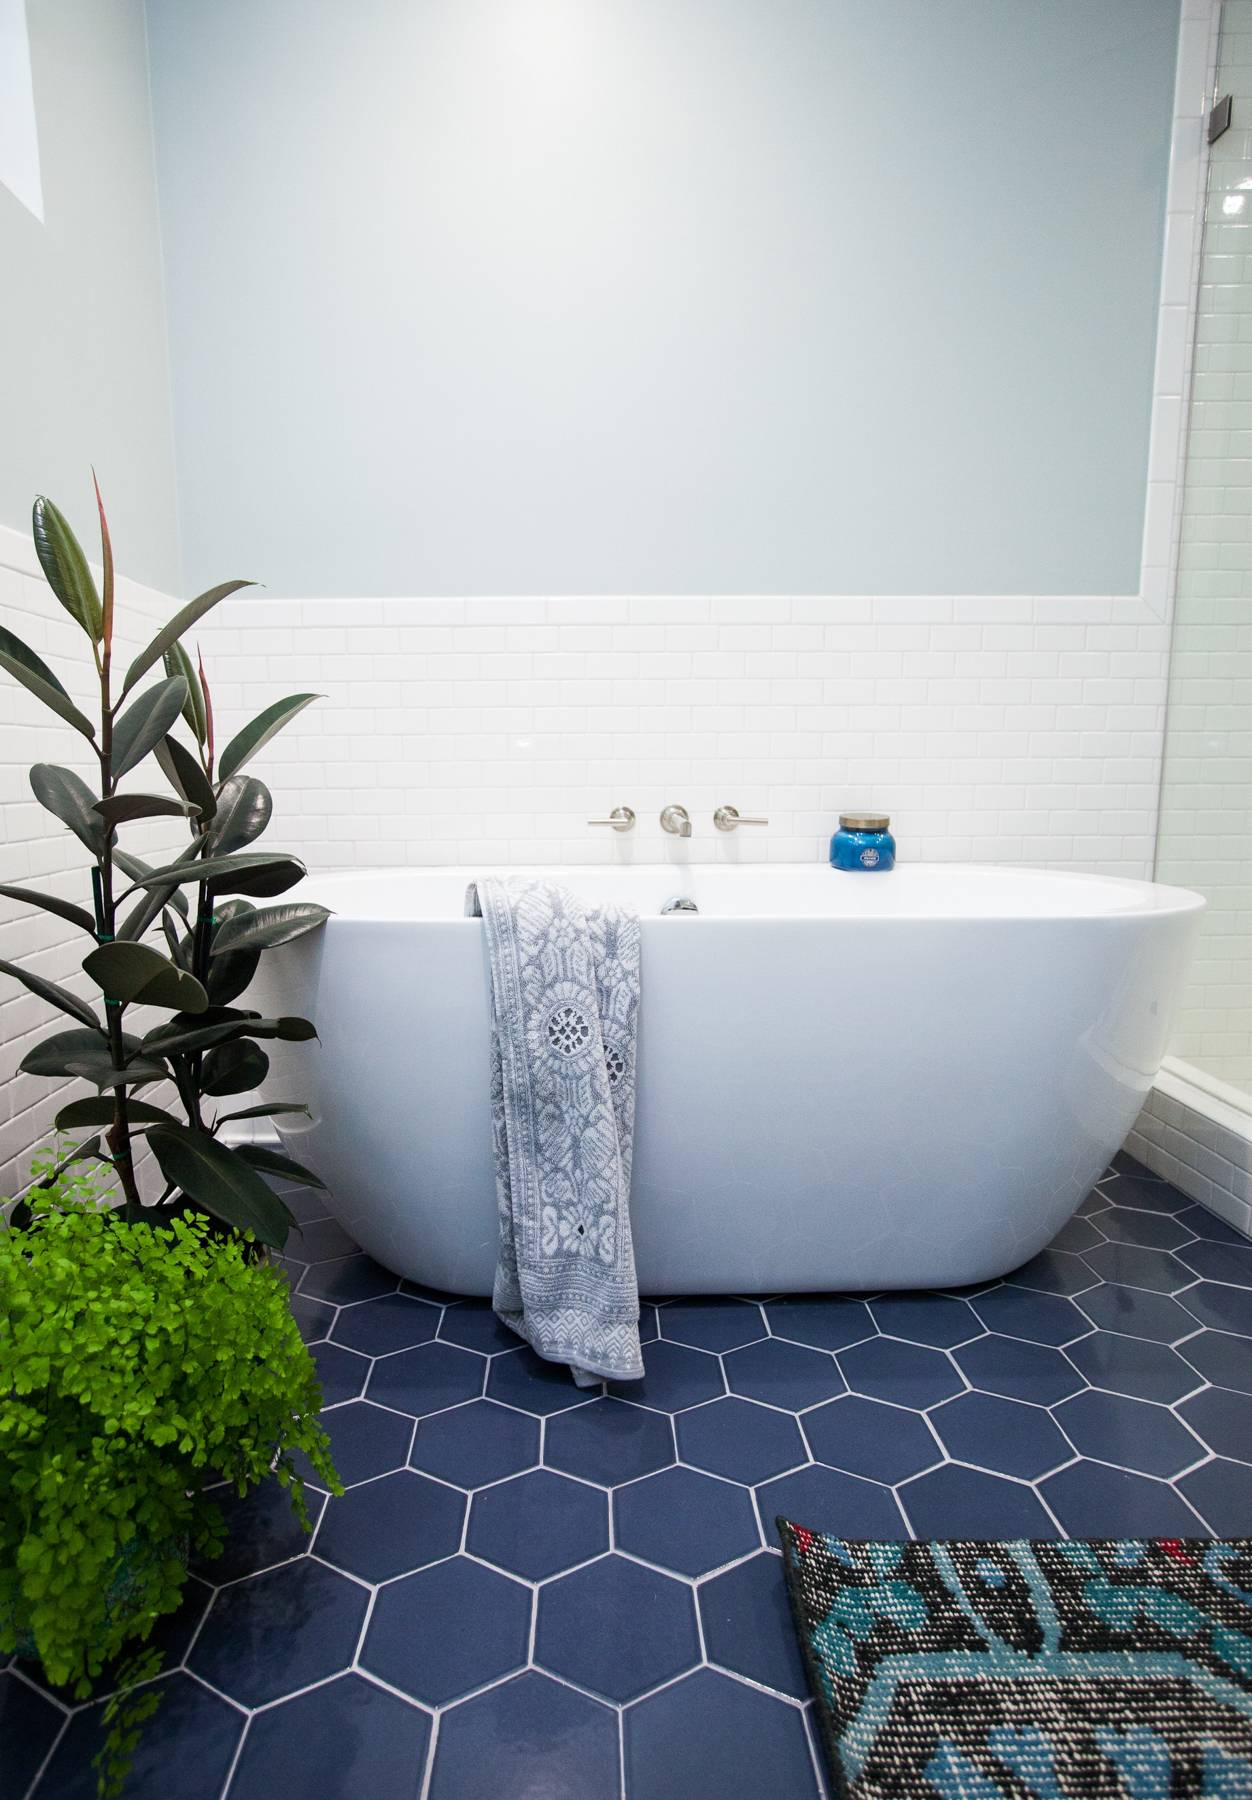 Bathtub on blue hex tiles